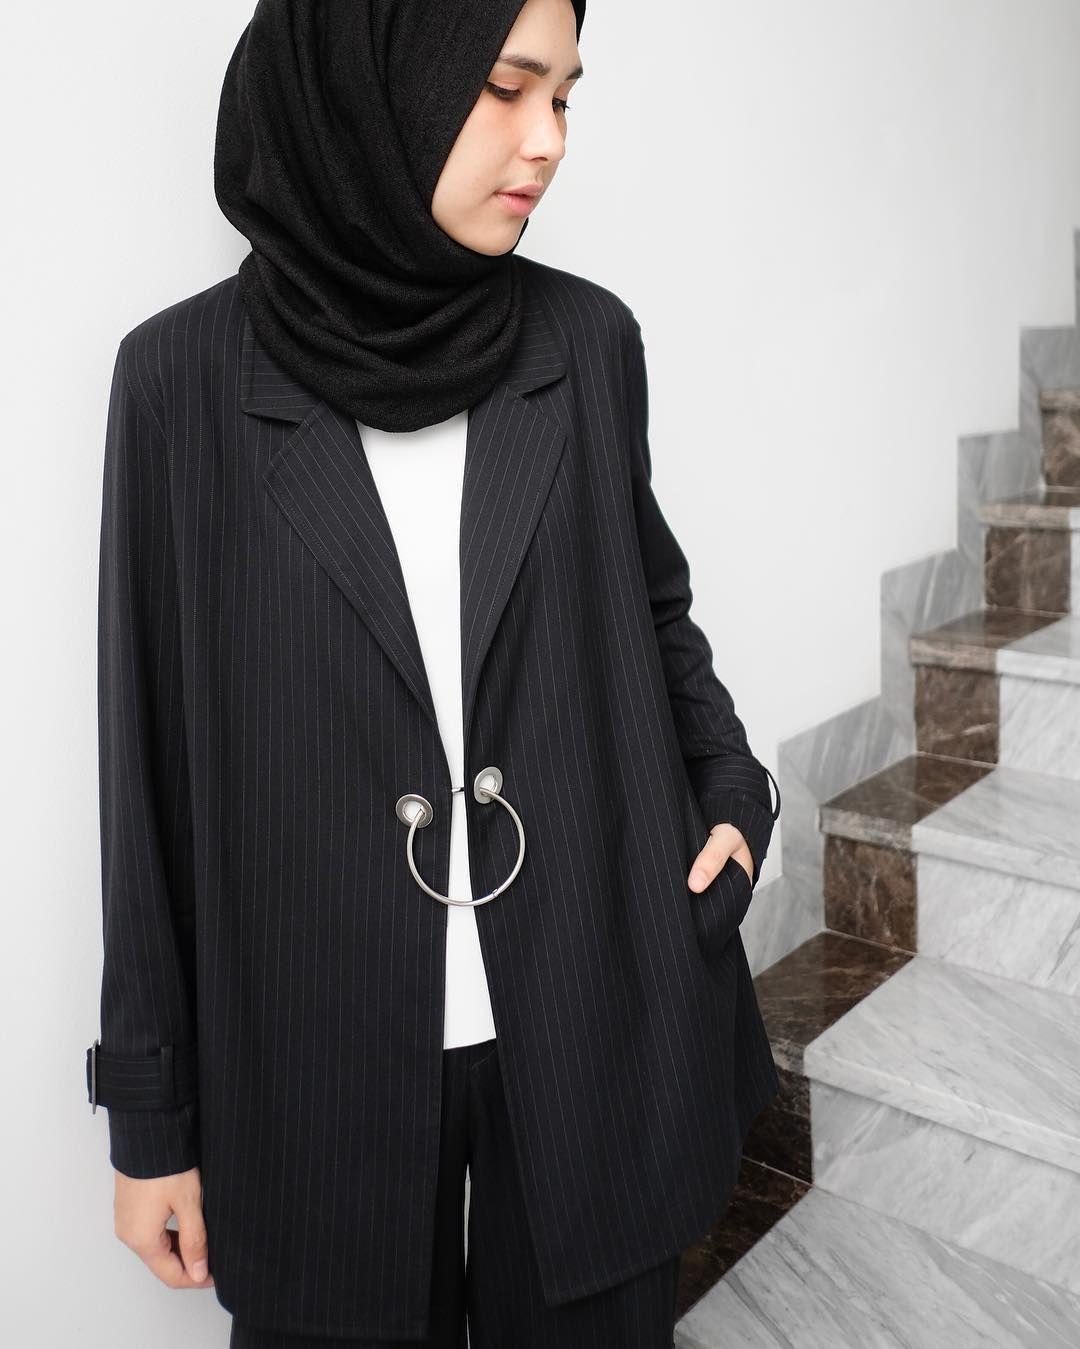 new arrivals 7f6df 6195e Pin by Terosha Reynanda on HIJABI//CASUAL in 2019   Hijab ...